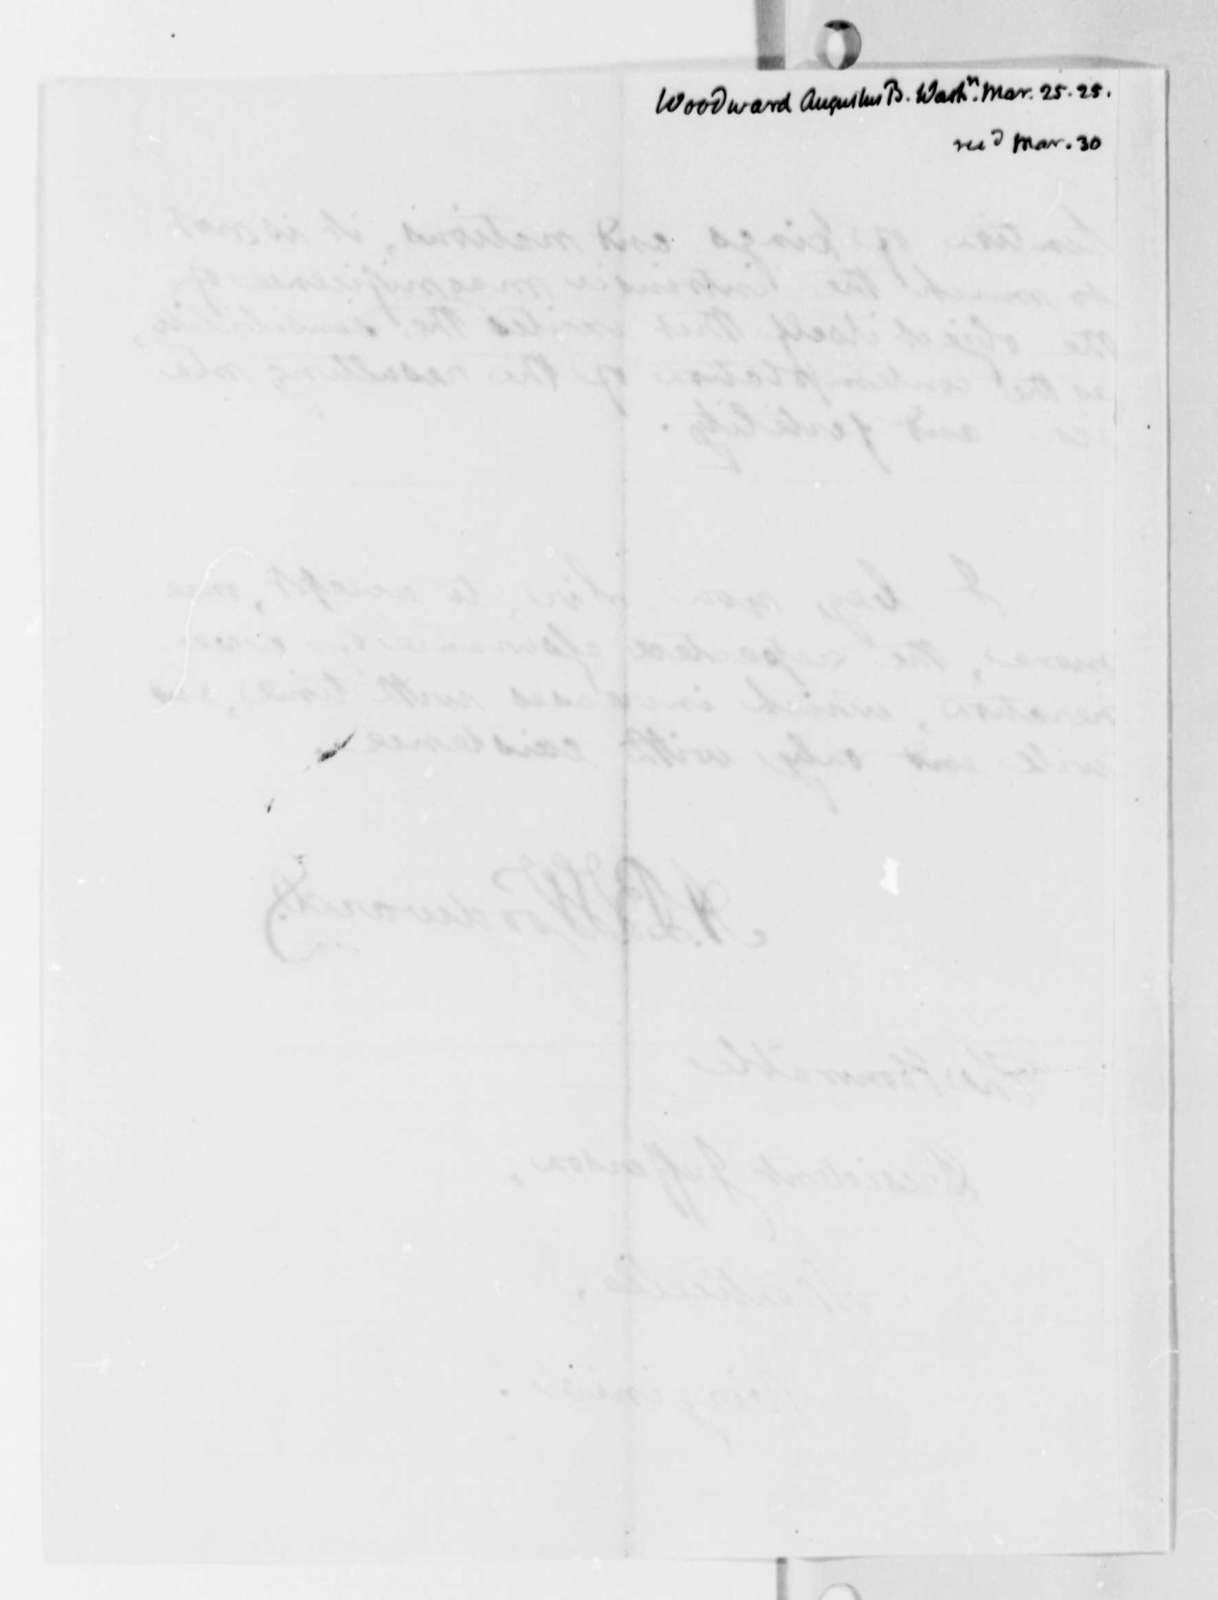 Augustus B. Woodward to Thomas Jefferson, March 25, 1825